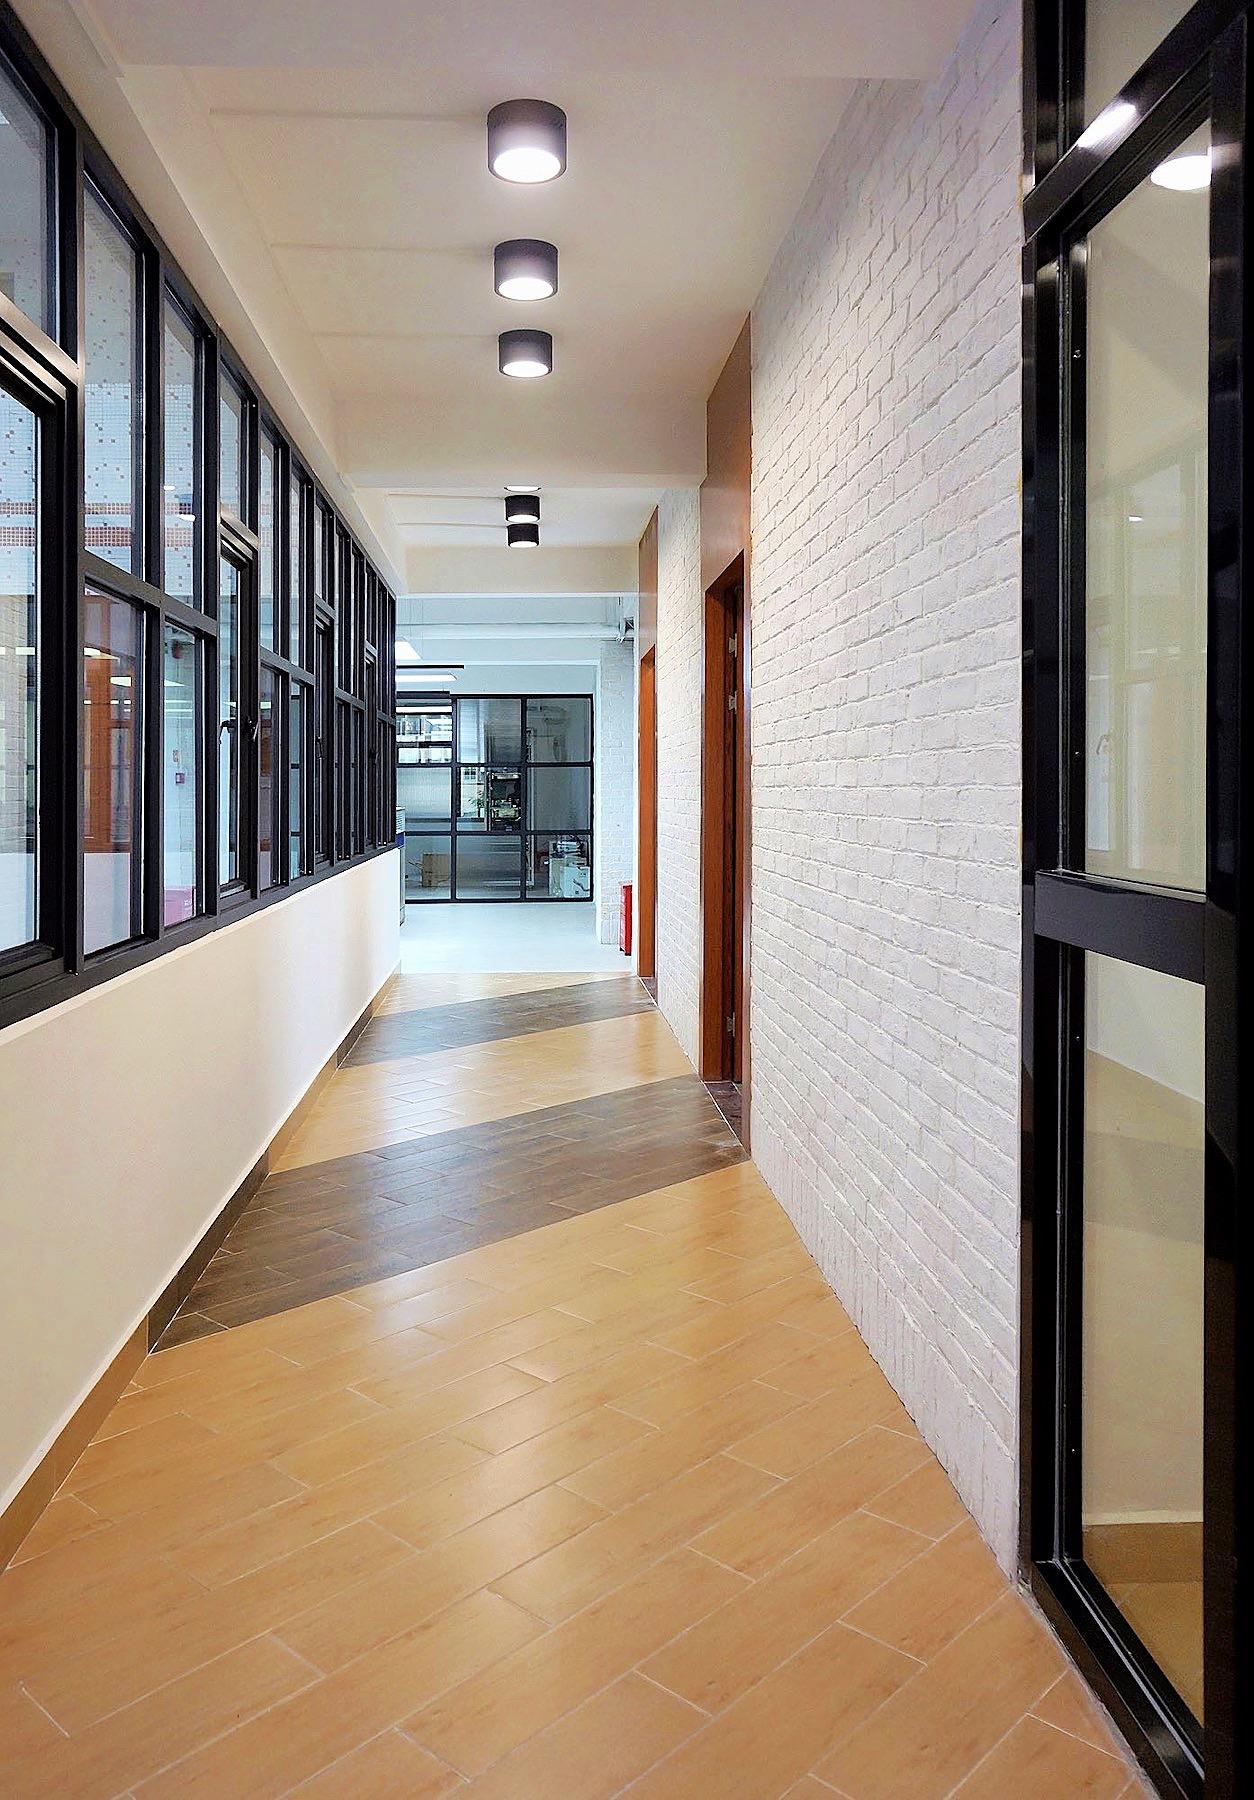 Grandway Office Renovation 2018 2nd Floor Boss Room Corridor 009